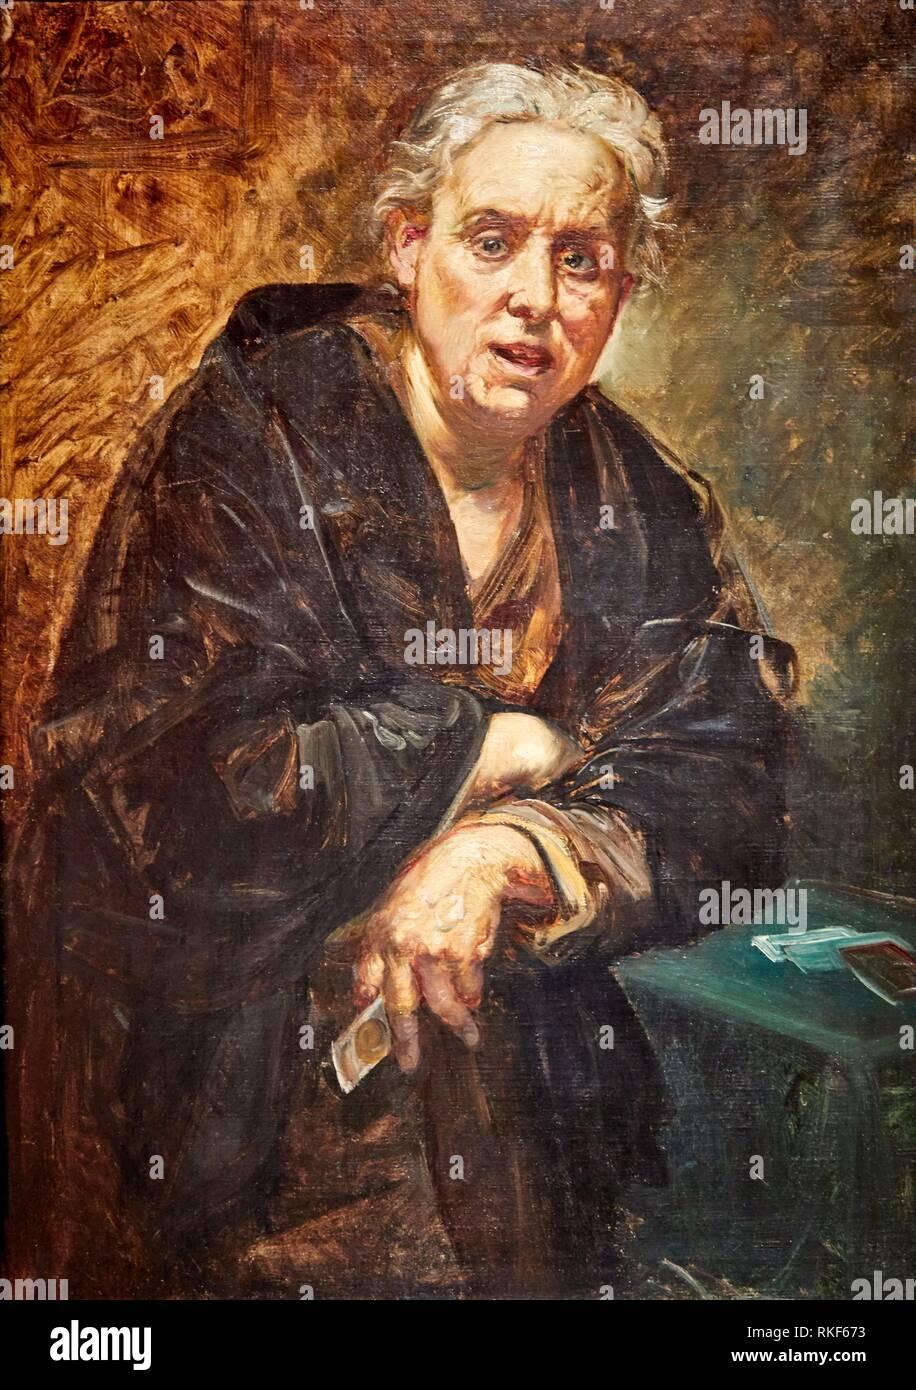 '''The Fortune Teller'', c. 1873, Ramon Martí i Alsina, National Museum of Catalan Art, Museu Nacional d Art de Catalunya, MNAC, Barcelona, Spain, - Stock Image